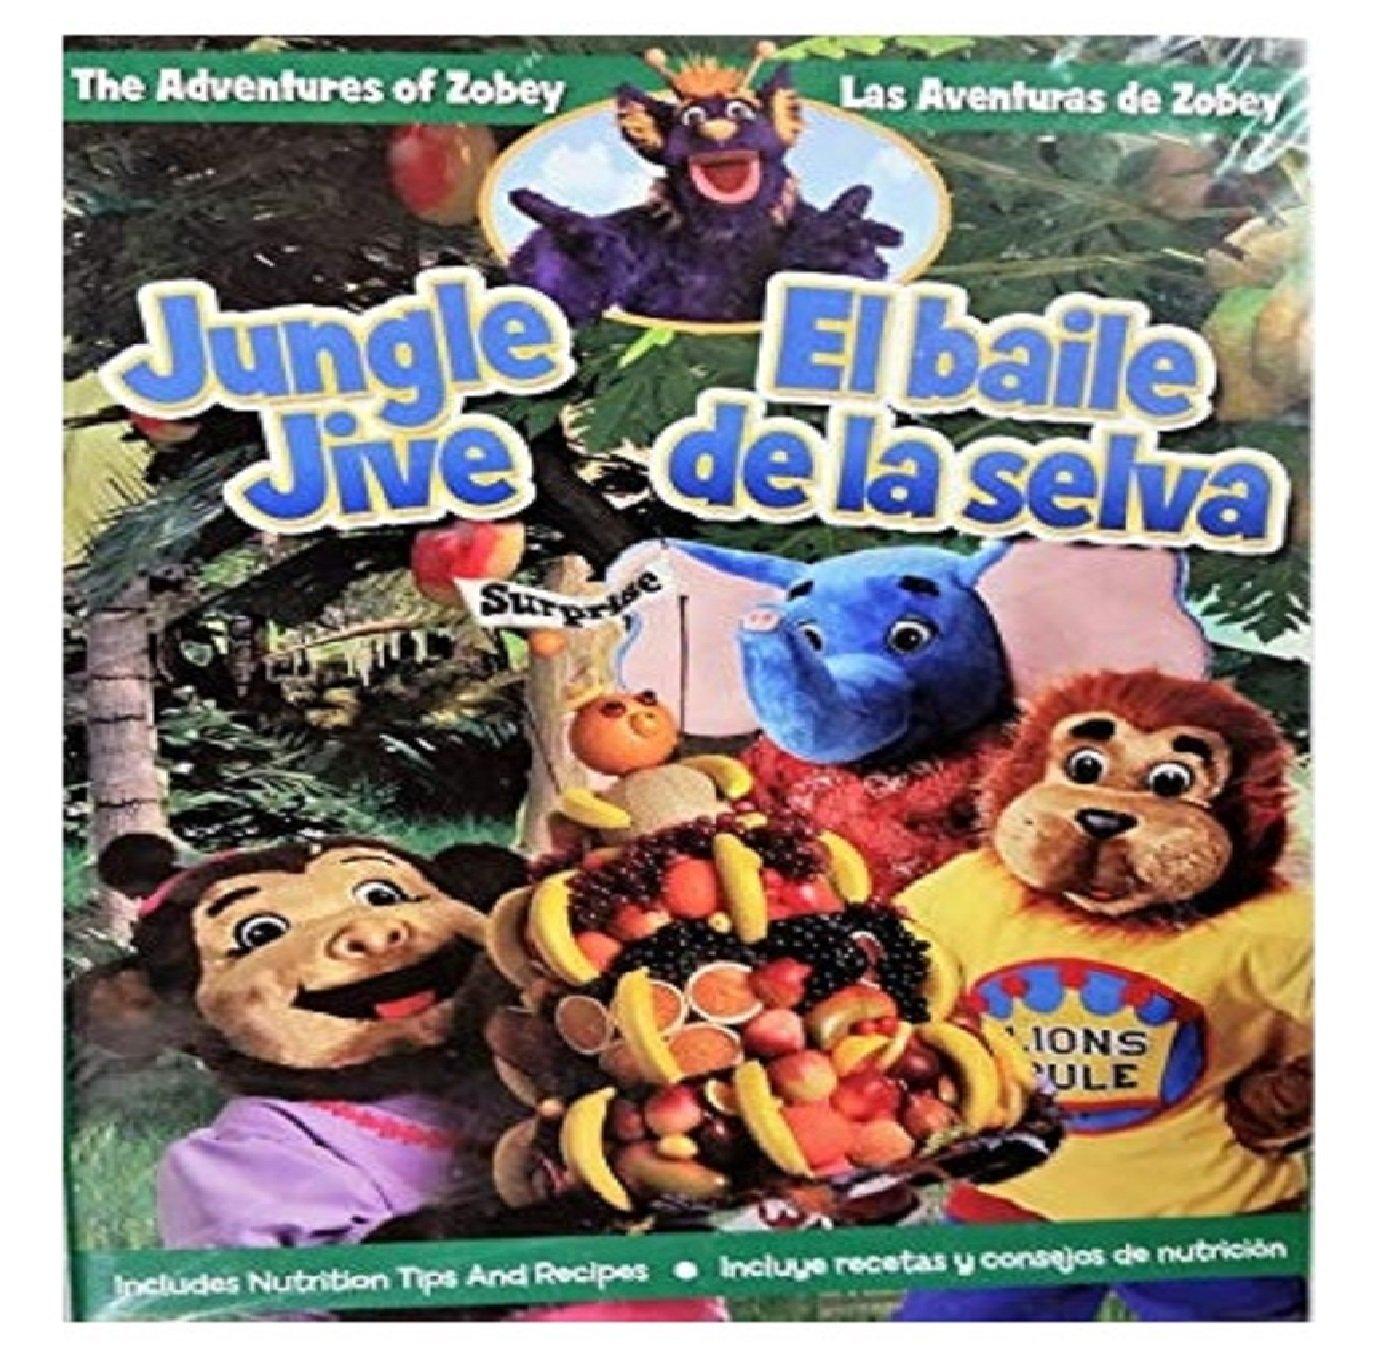 Amazon.com: Jungle Jive - The Adventures of Zobey - DVD ...